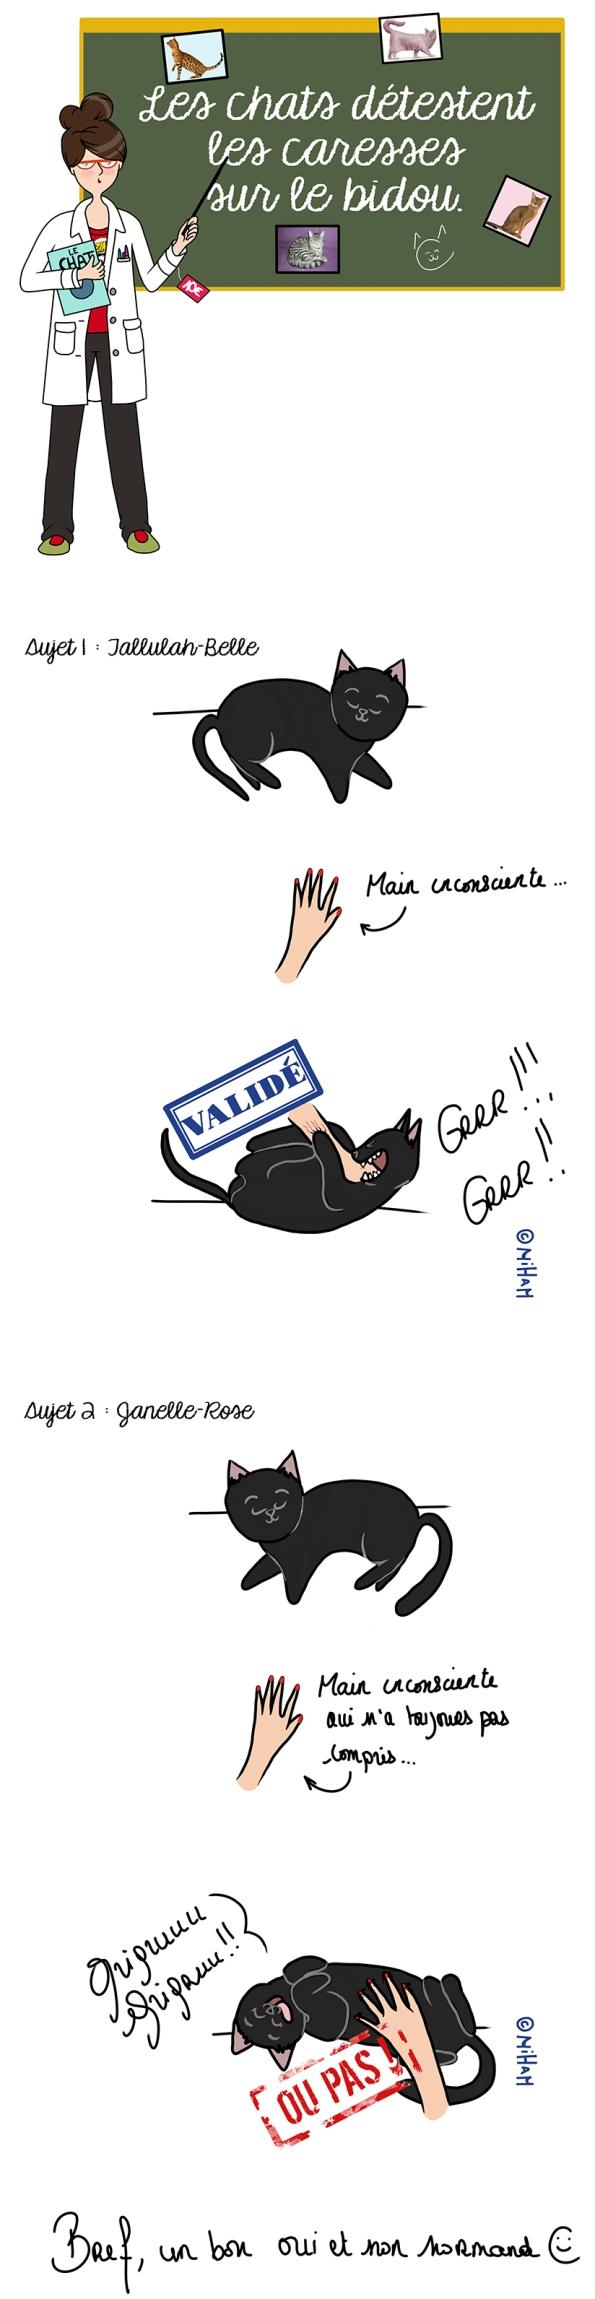 dessin-chat-miham-honfleur